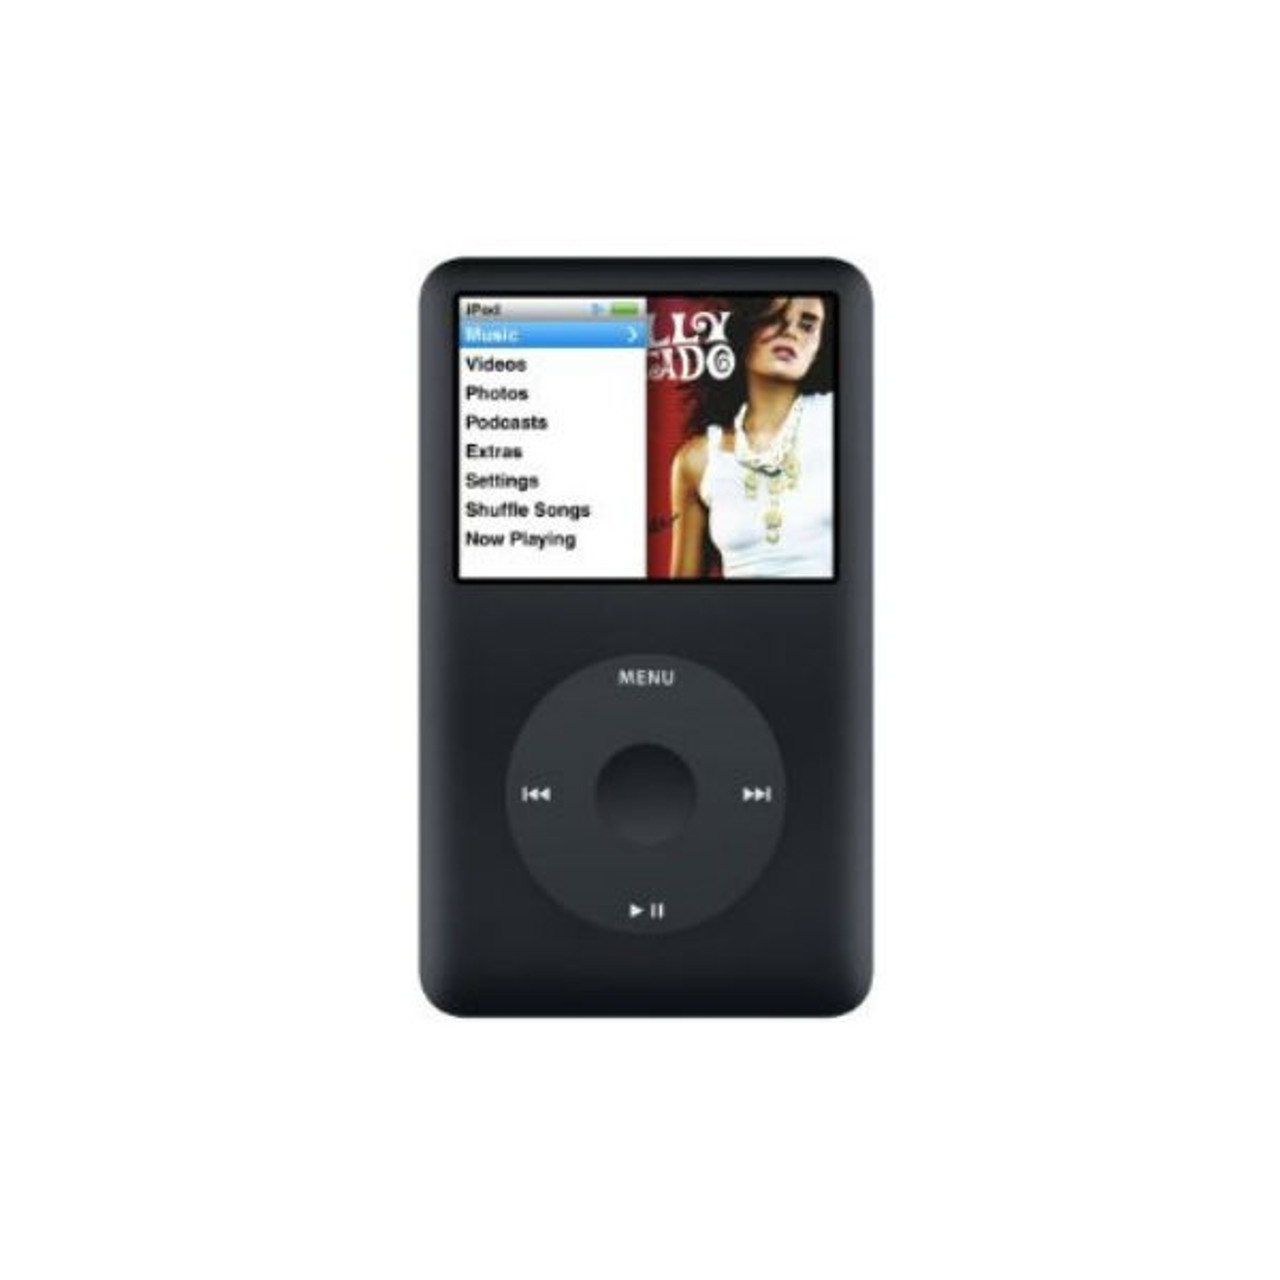 refurbished Apple iPod Classic